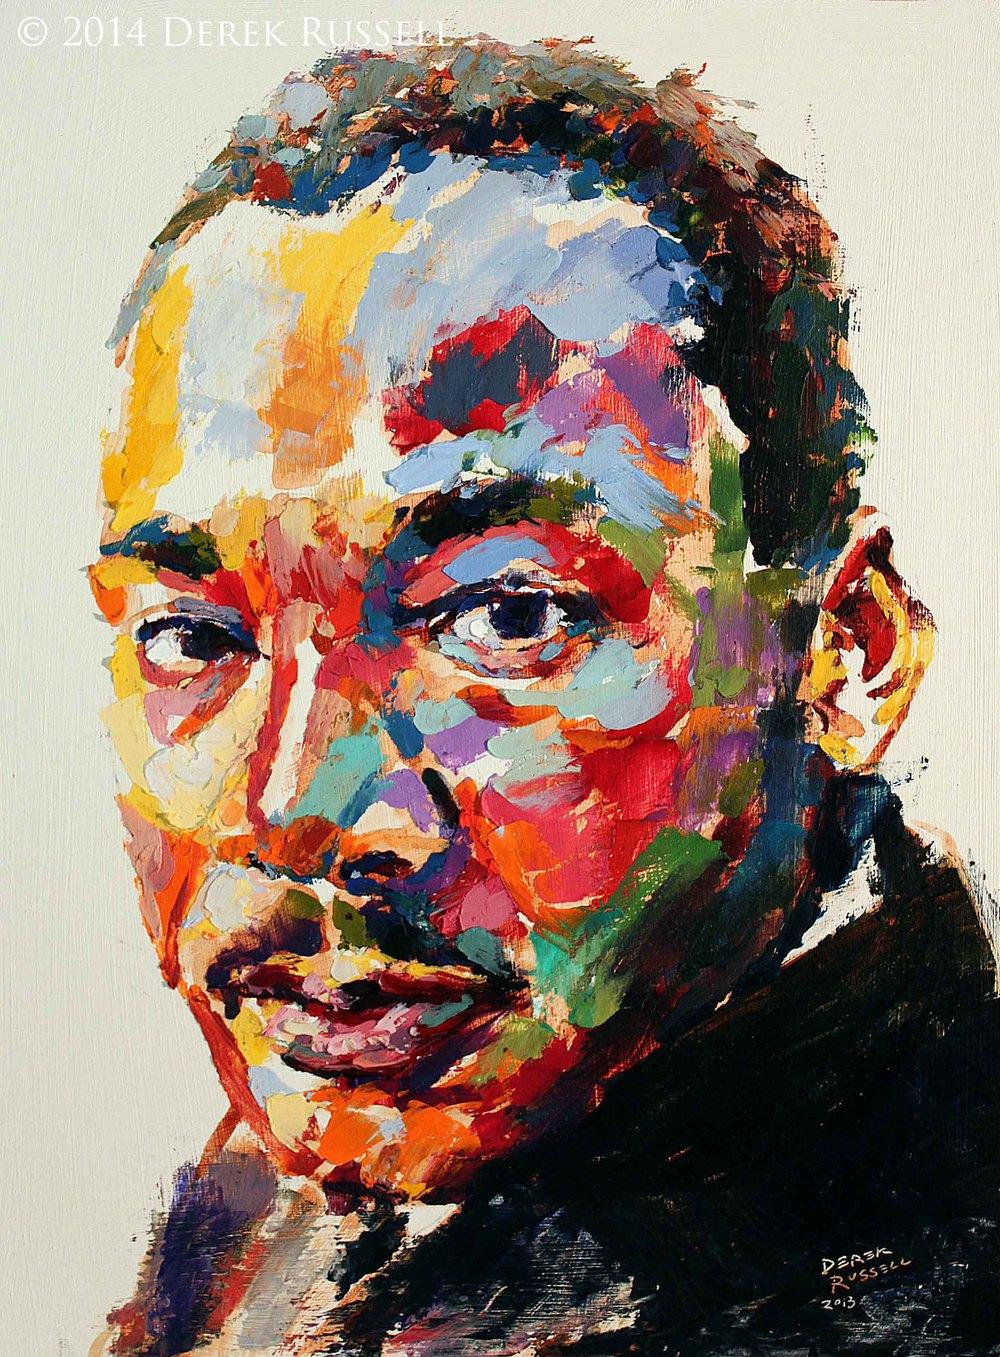 Original Oil Portrait Painting by portrait & nature fine artist Derek Russell